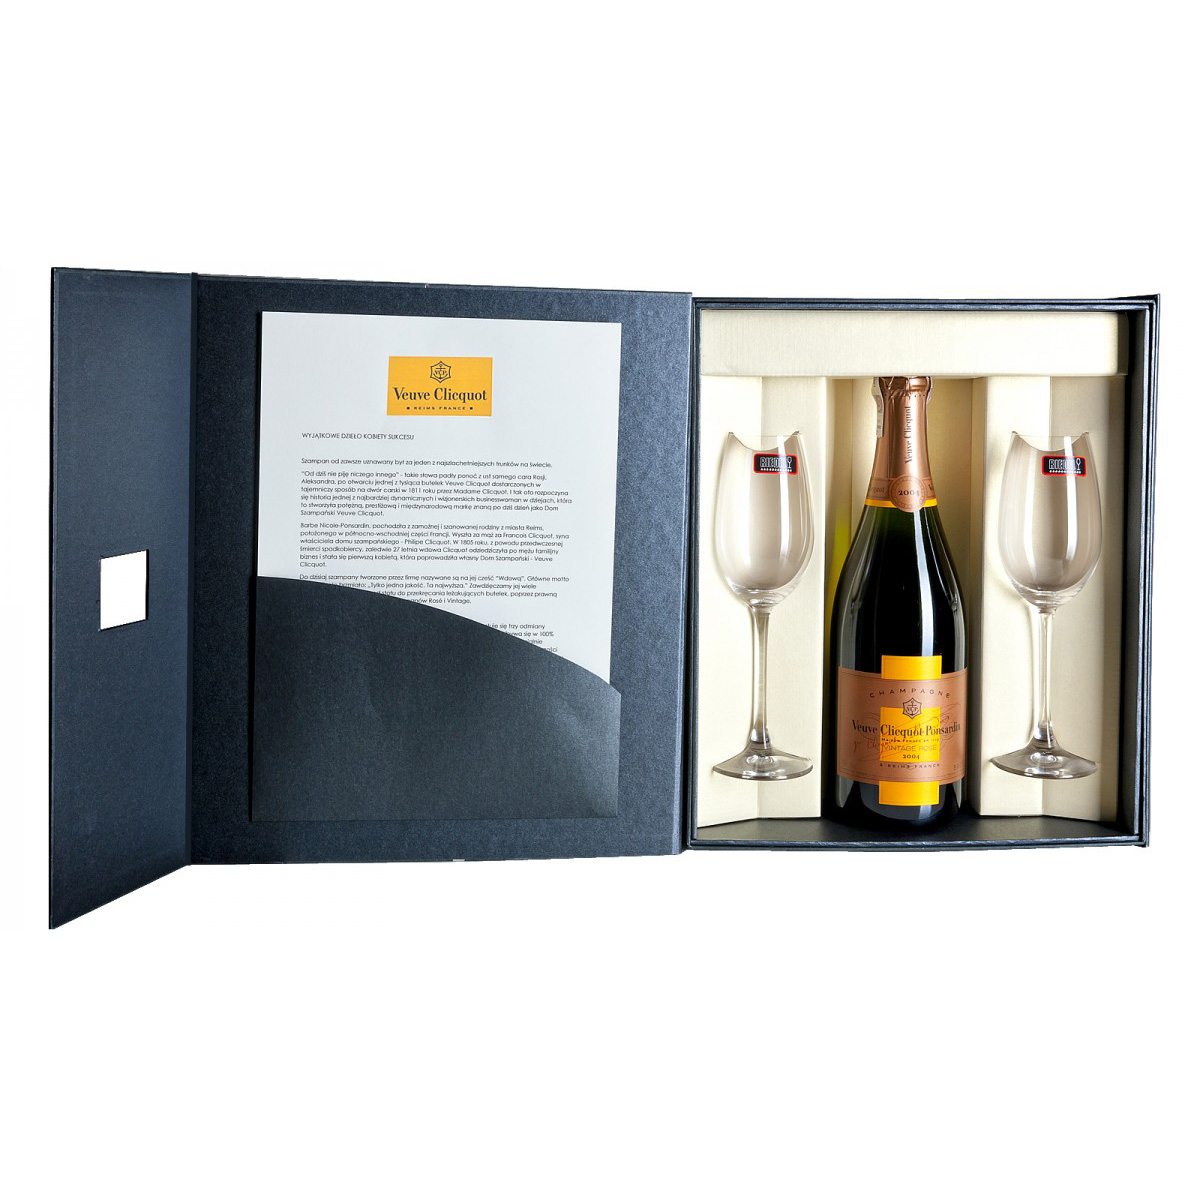 Zestaw prezentowy luksusowy - Veuve Clicquot Vintage Rosé 2012